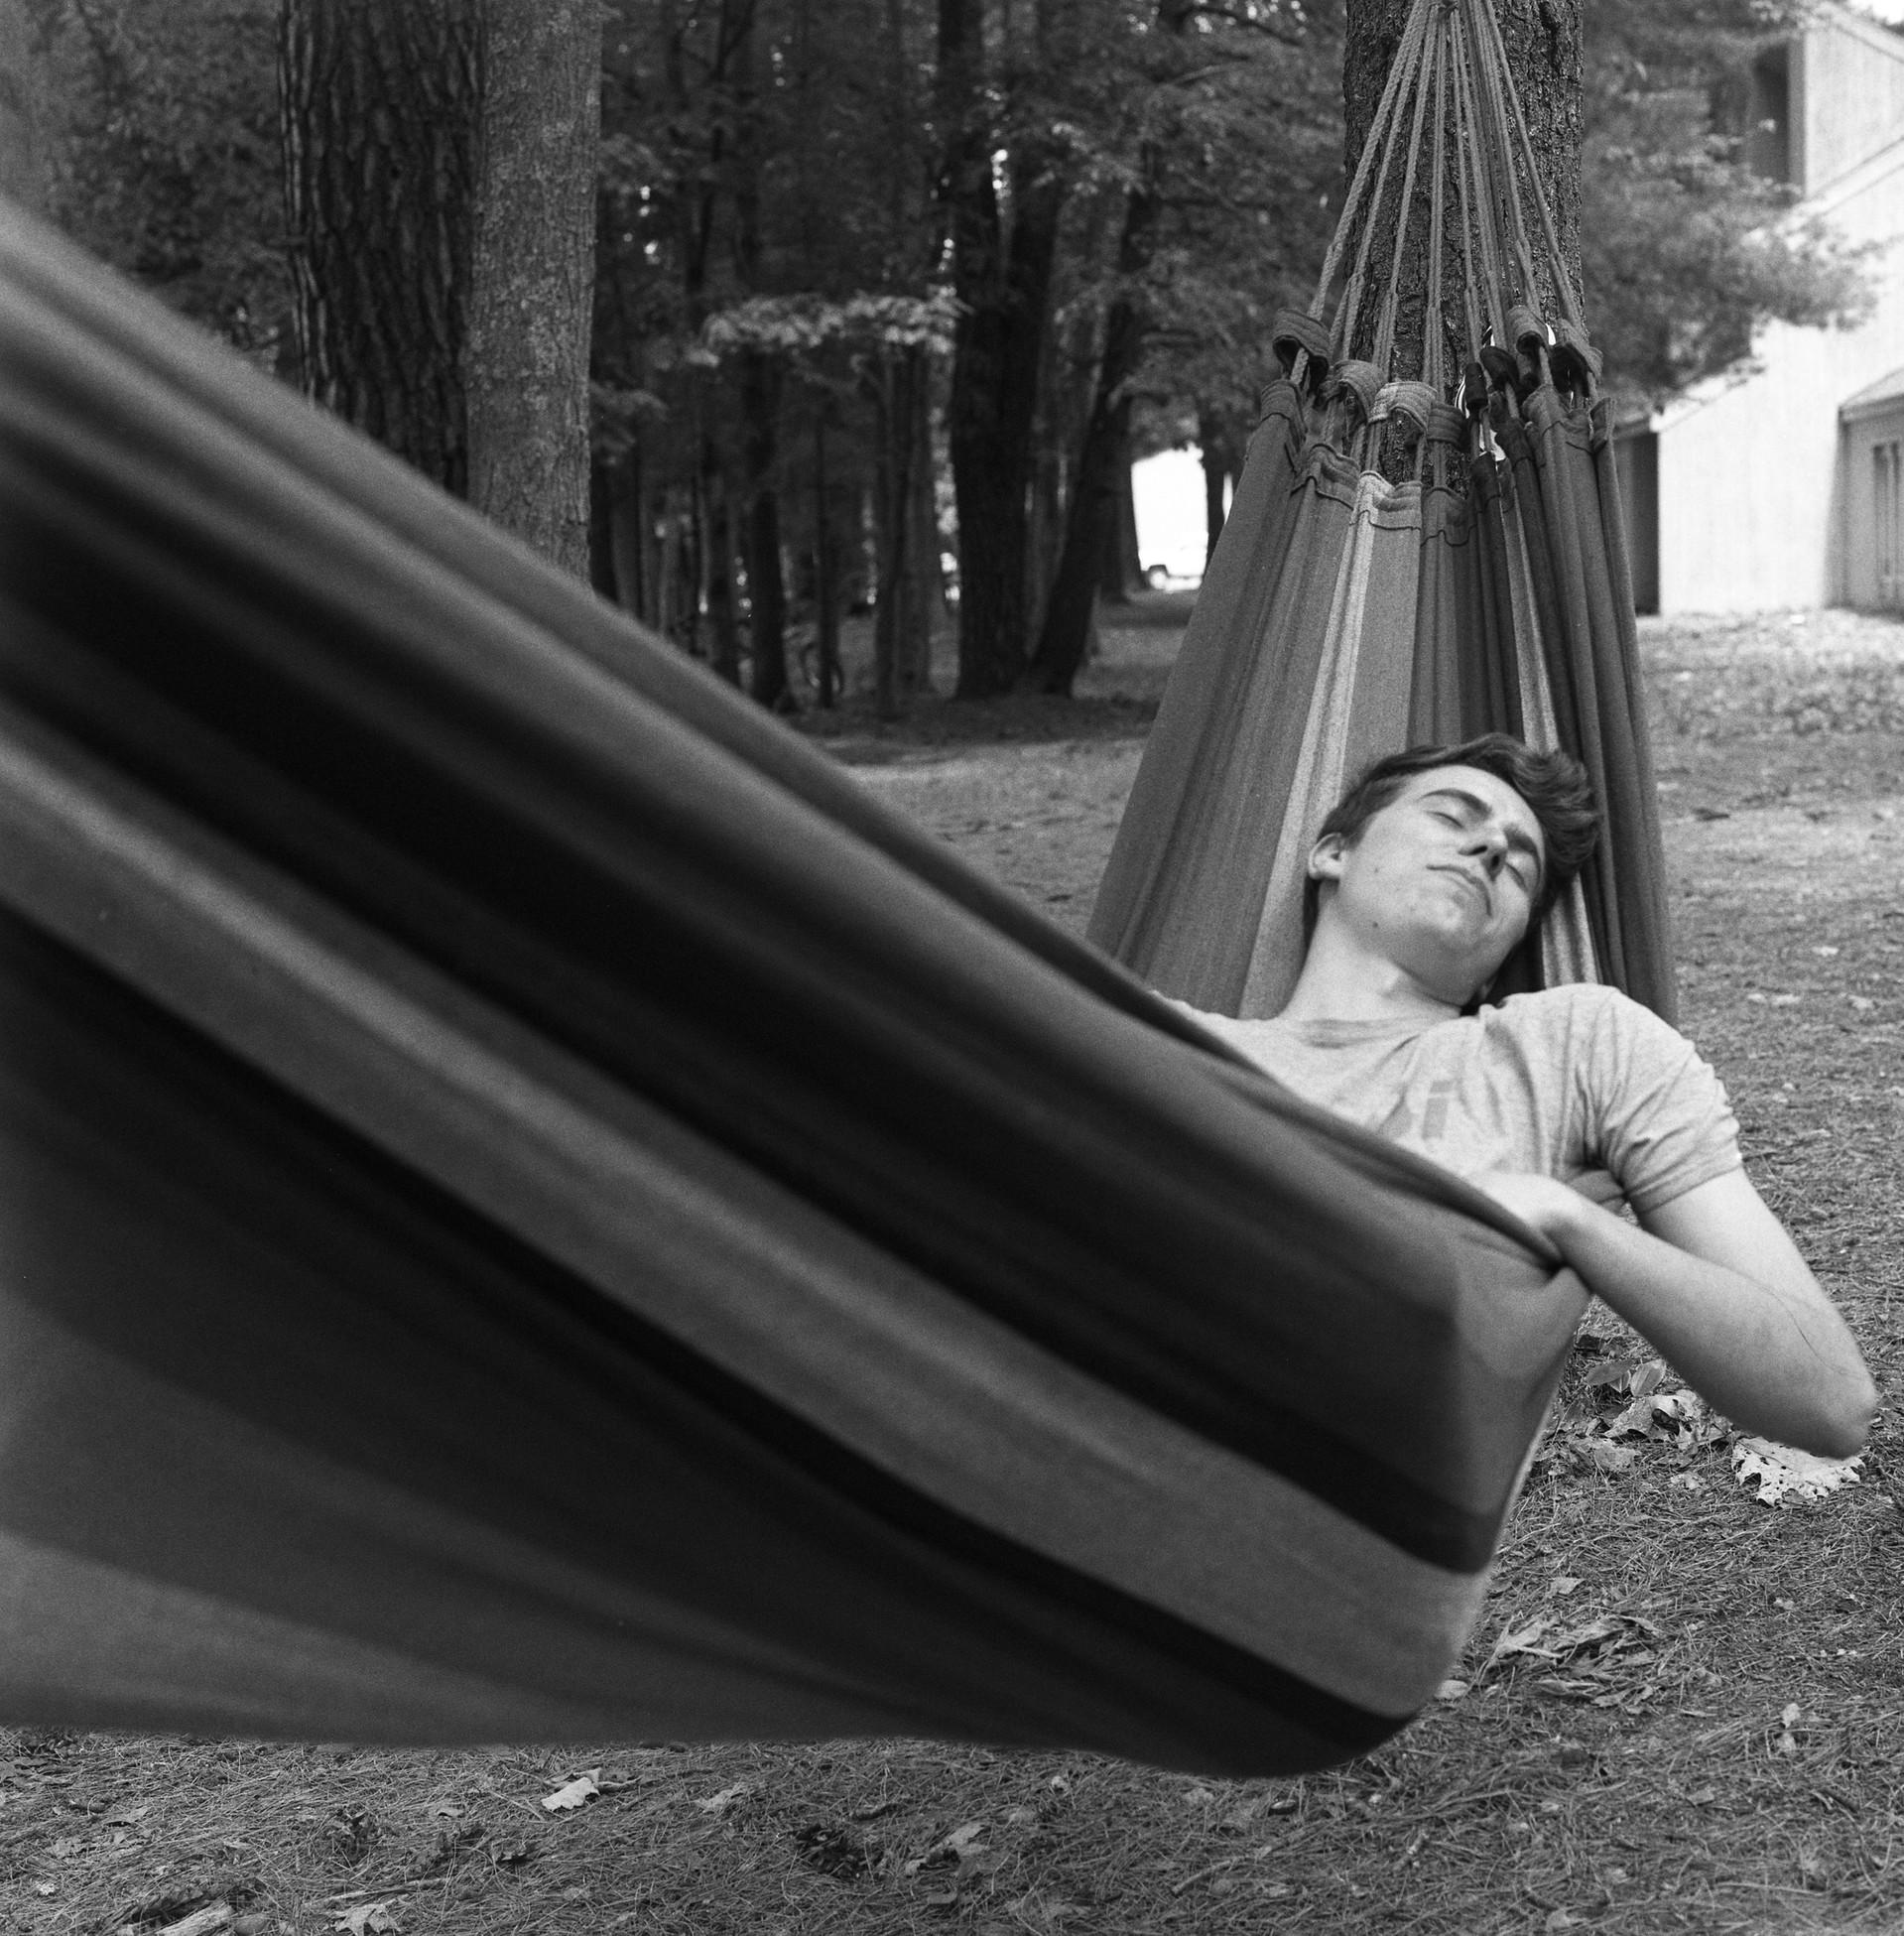 nick on hammock